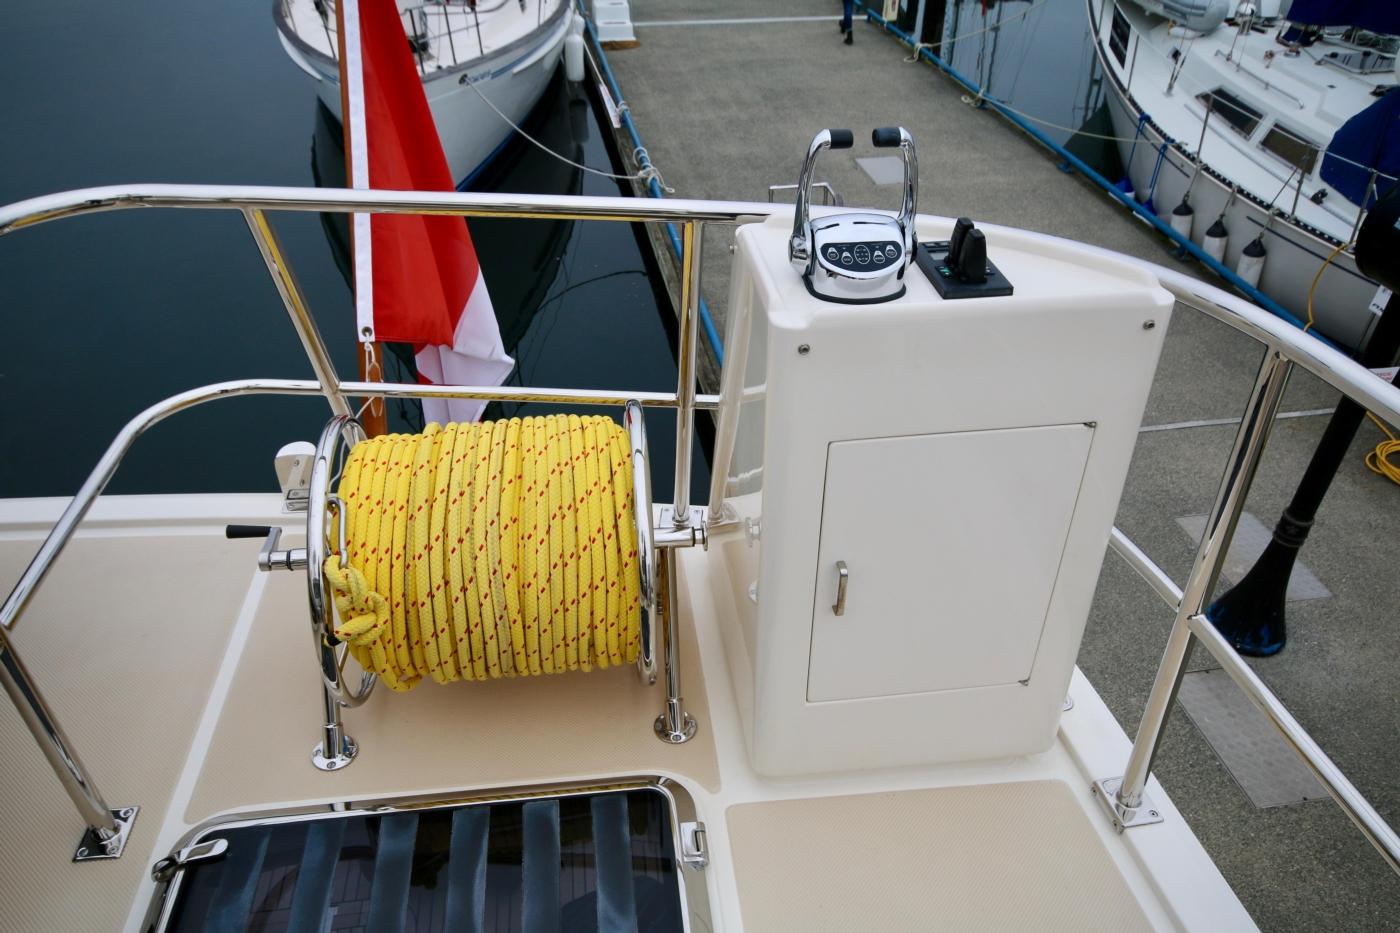 2015 Fleming 58 Pilothouse, Aft engine controls on boat deck